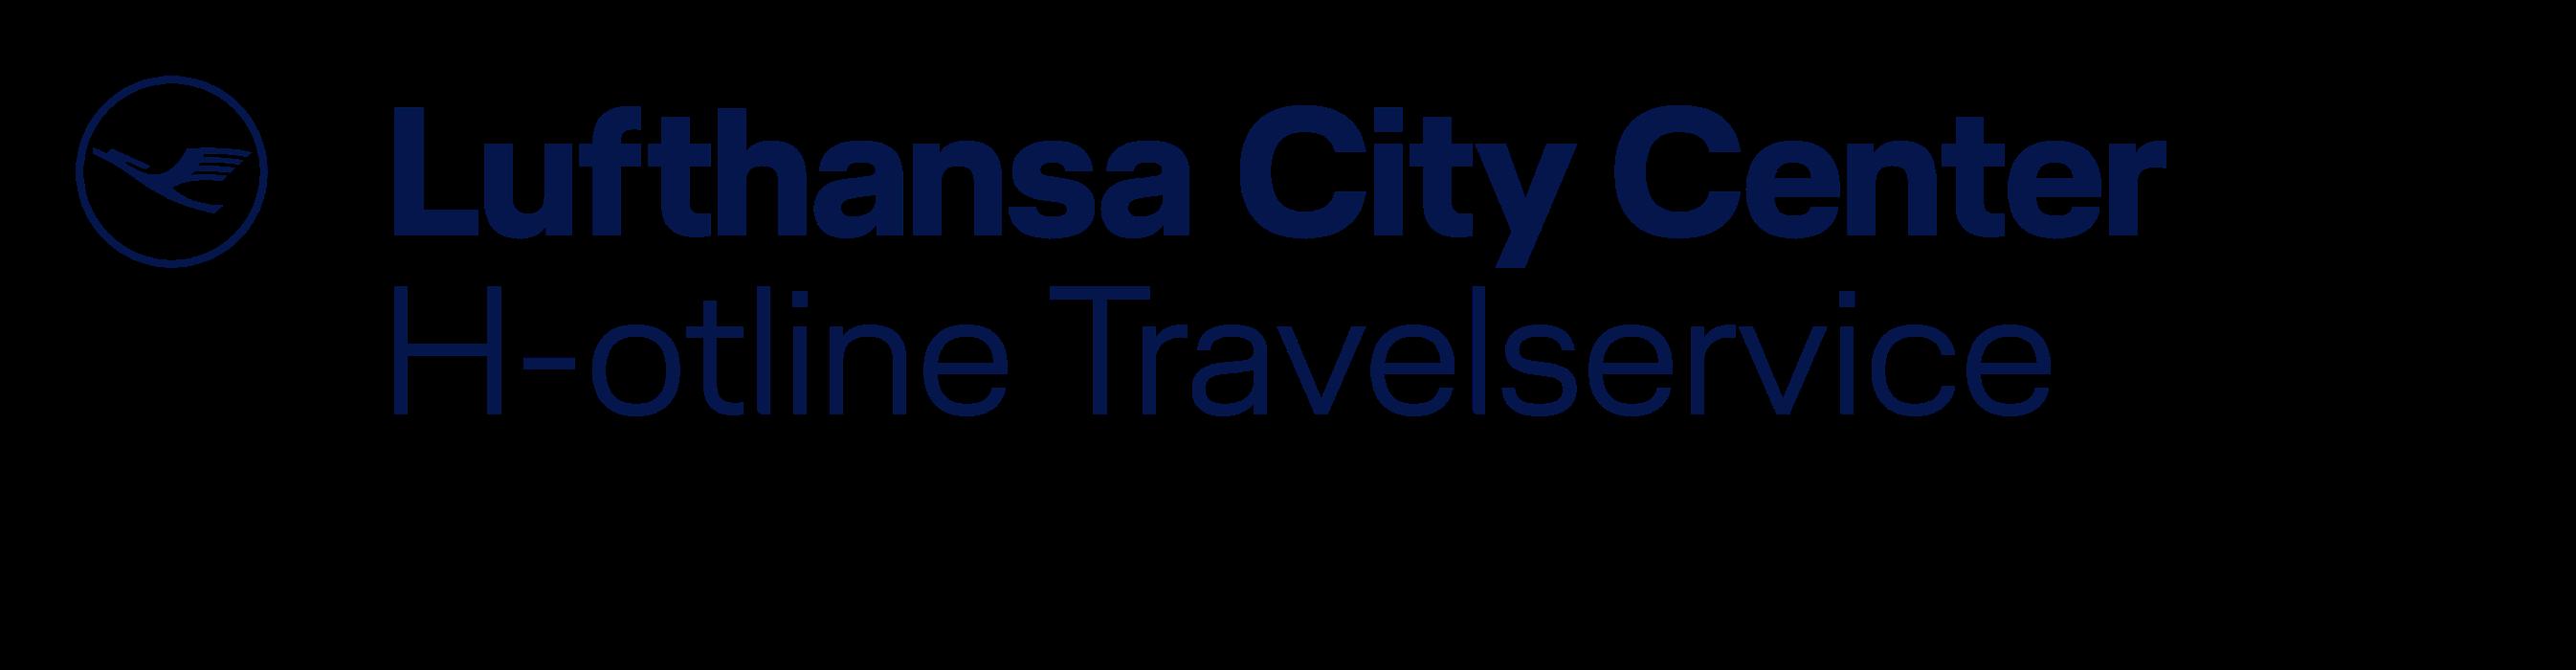 H-otline Travelservice GmbH Lufthansa City Center